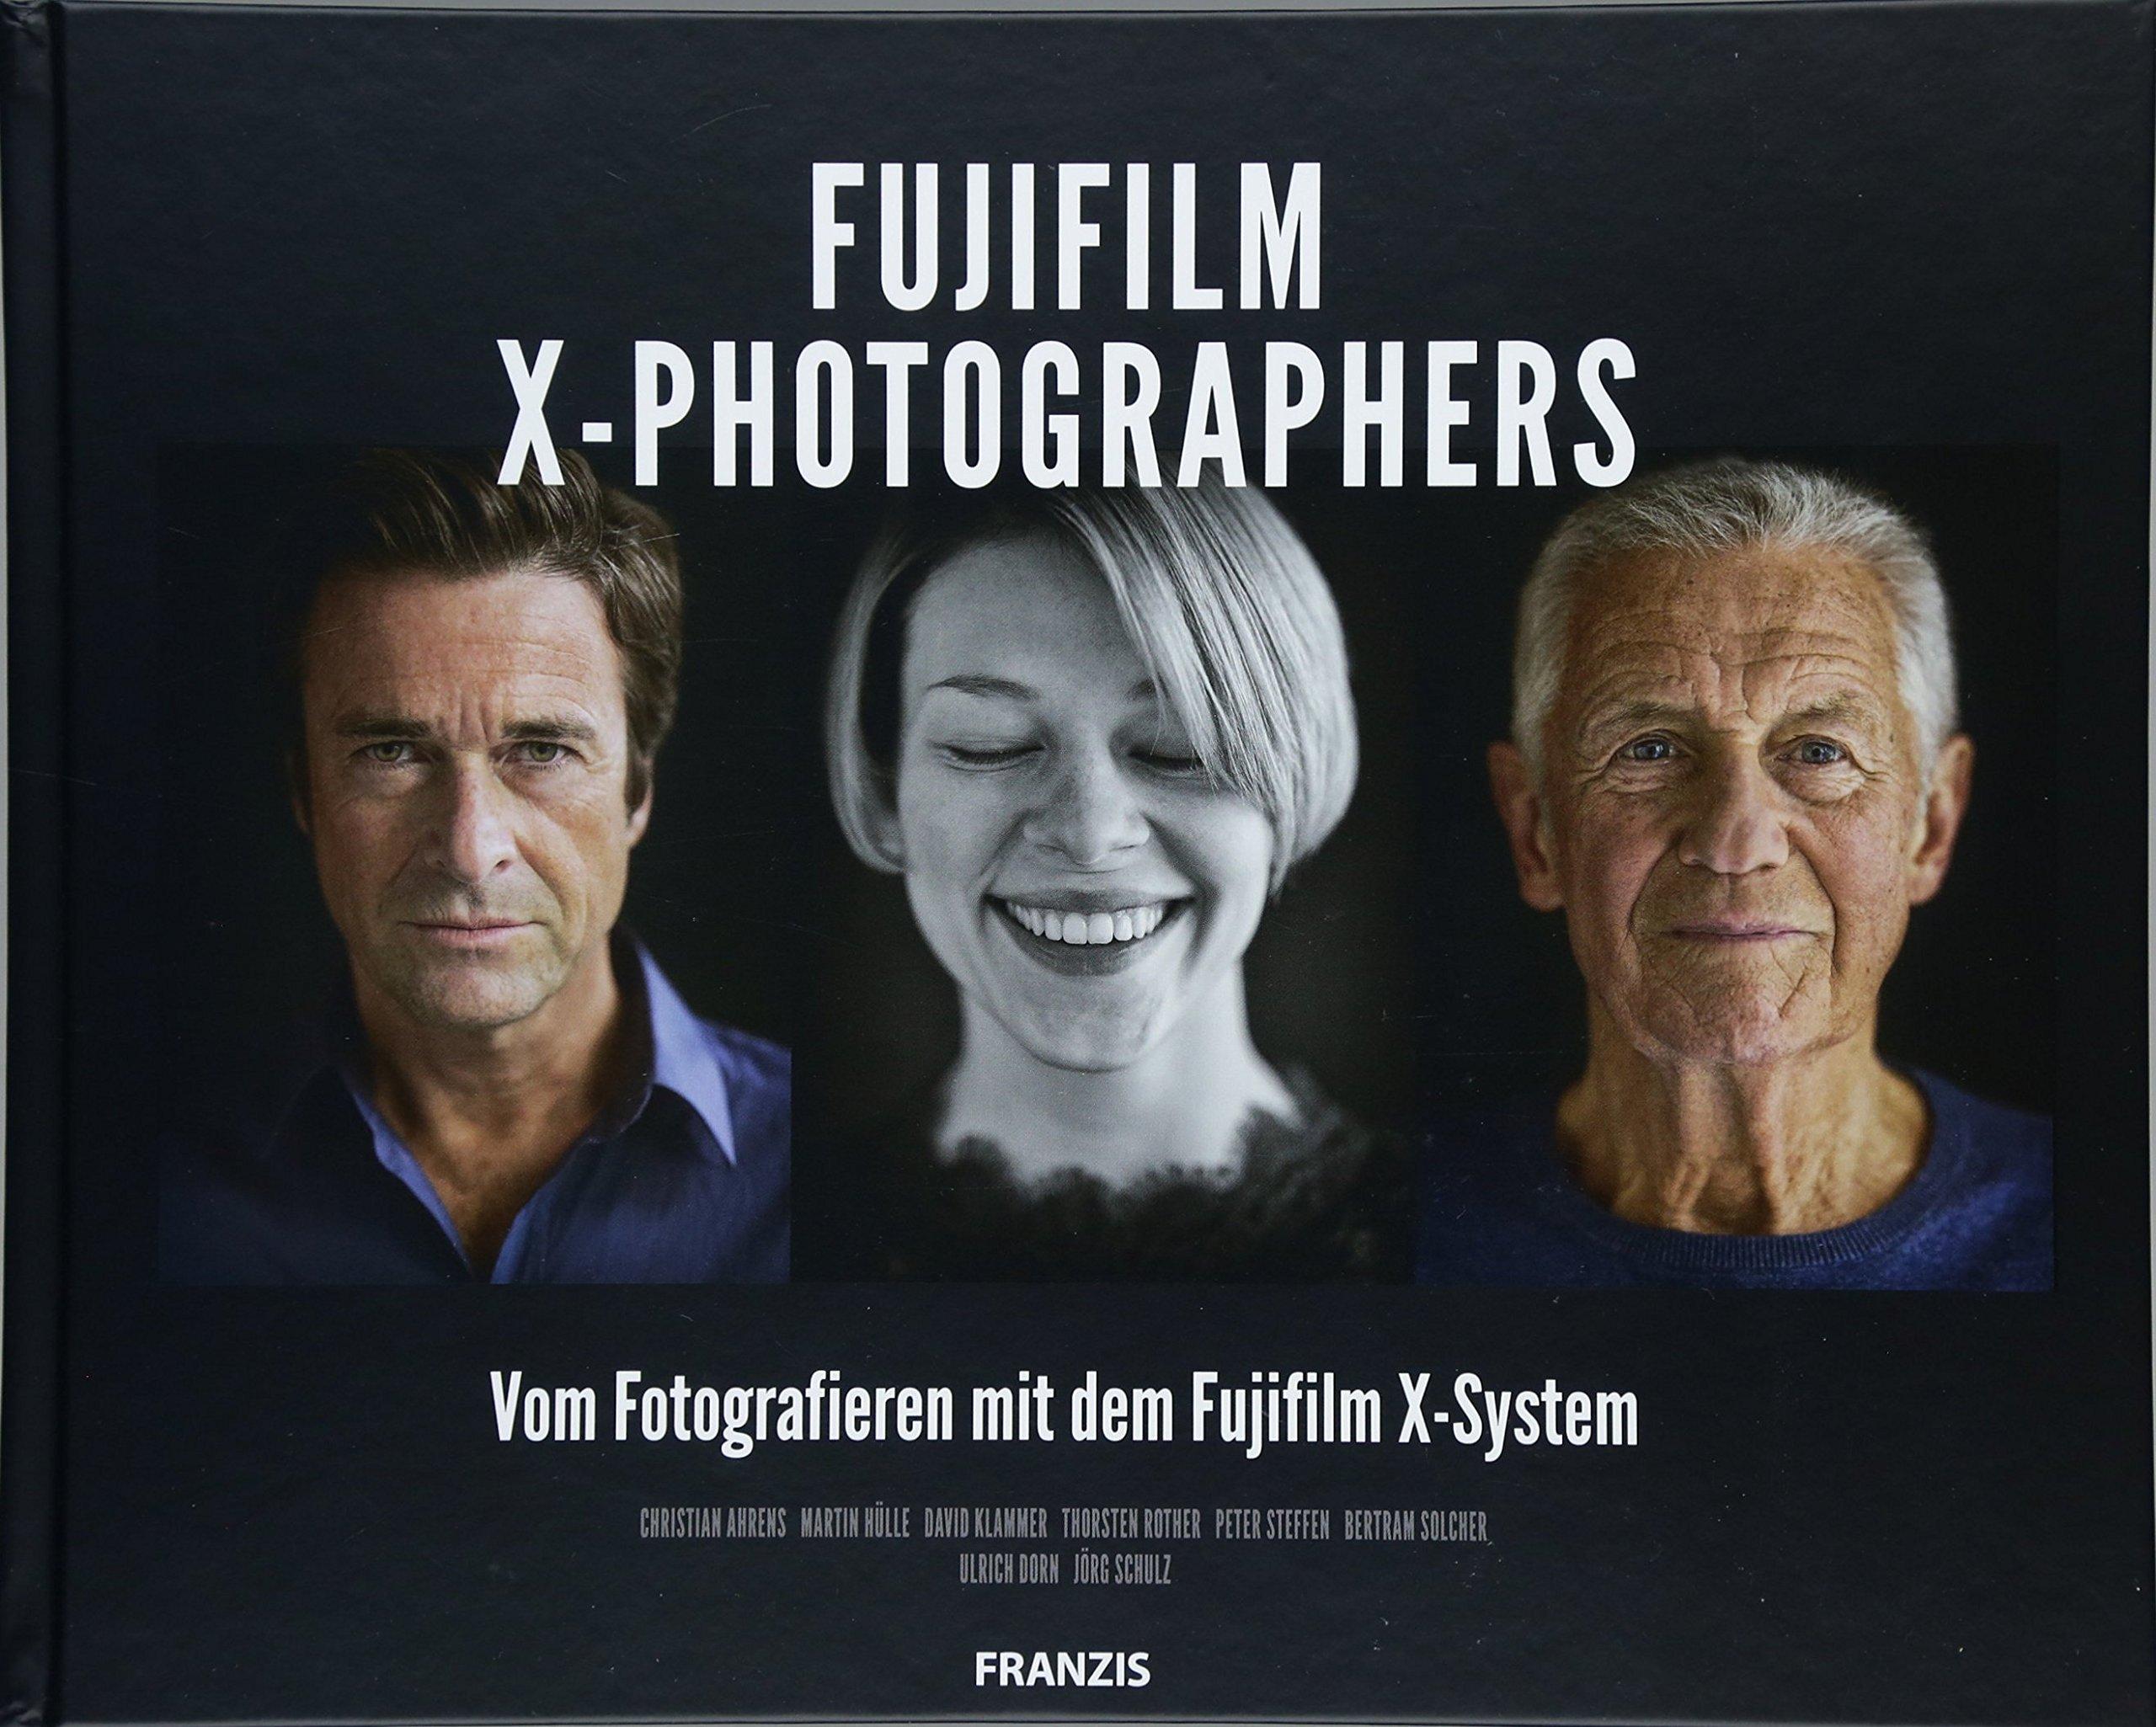 fujifilm-x-photographers-vom-fotografieren-mit-dem-fujifilm-x-system